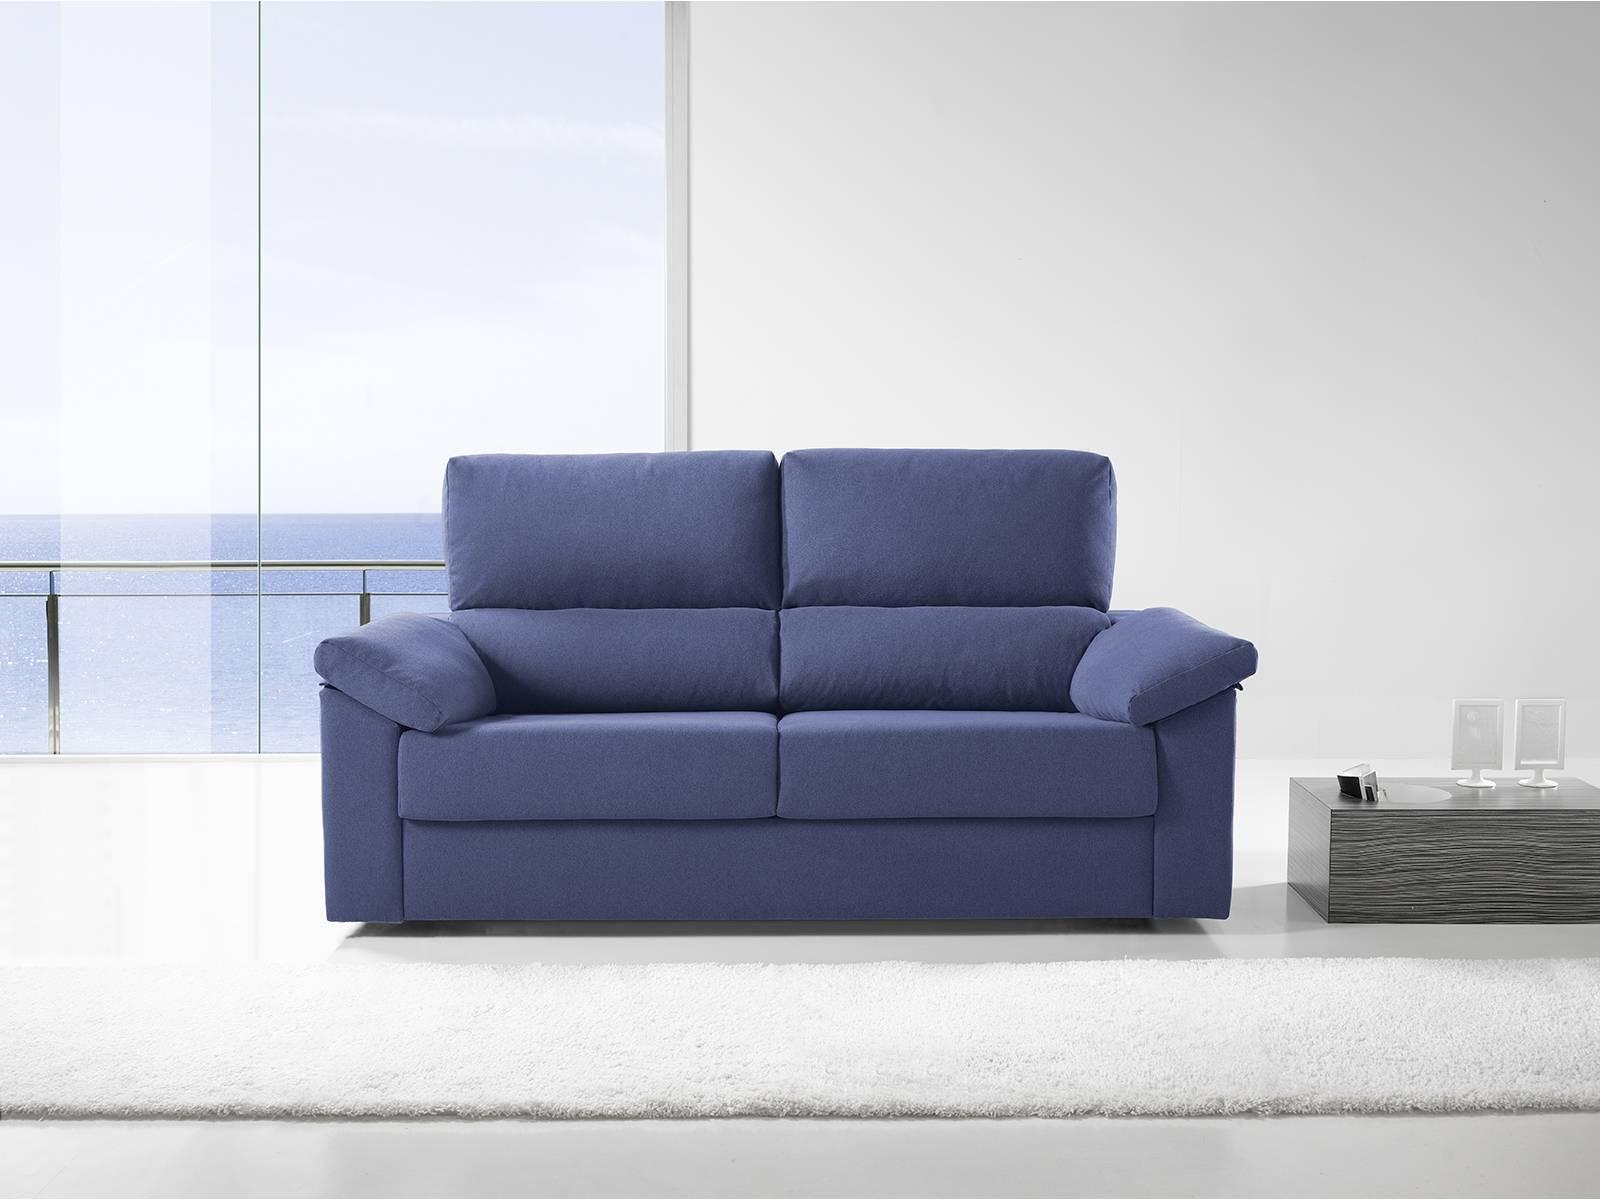 Merkamueble sofas U3dh sofà Cama Sistema Italiano Lucà A